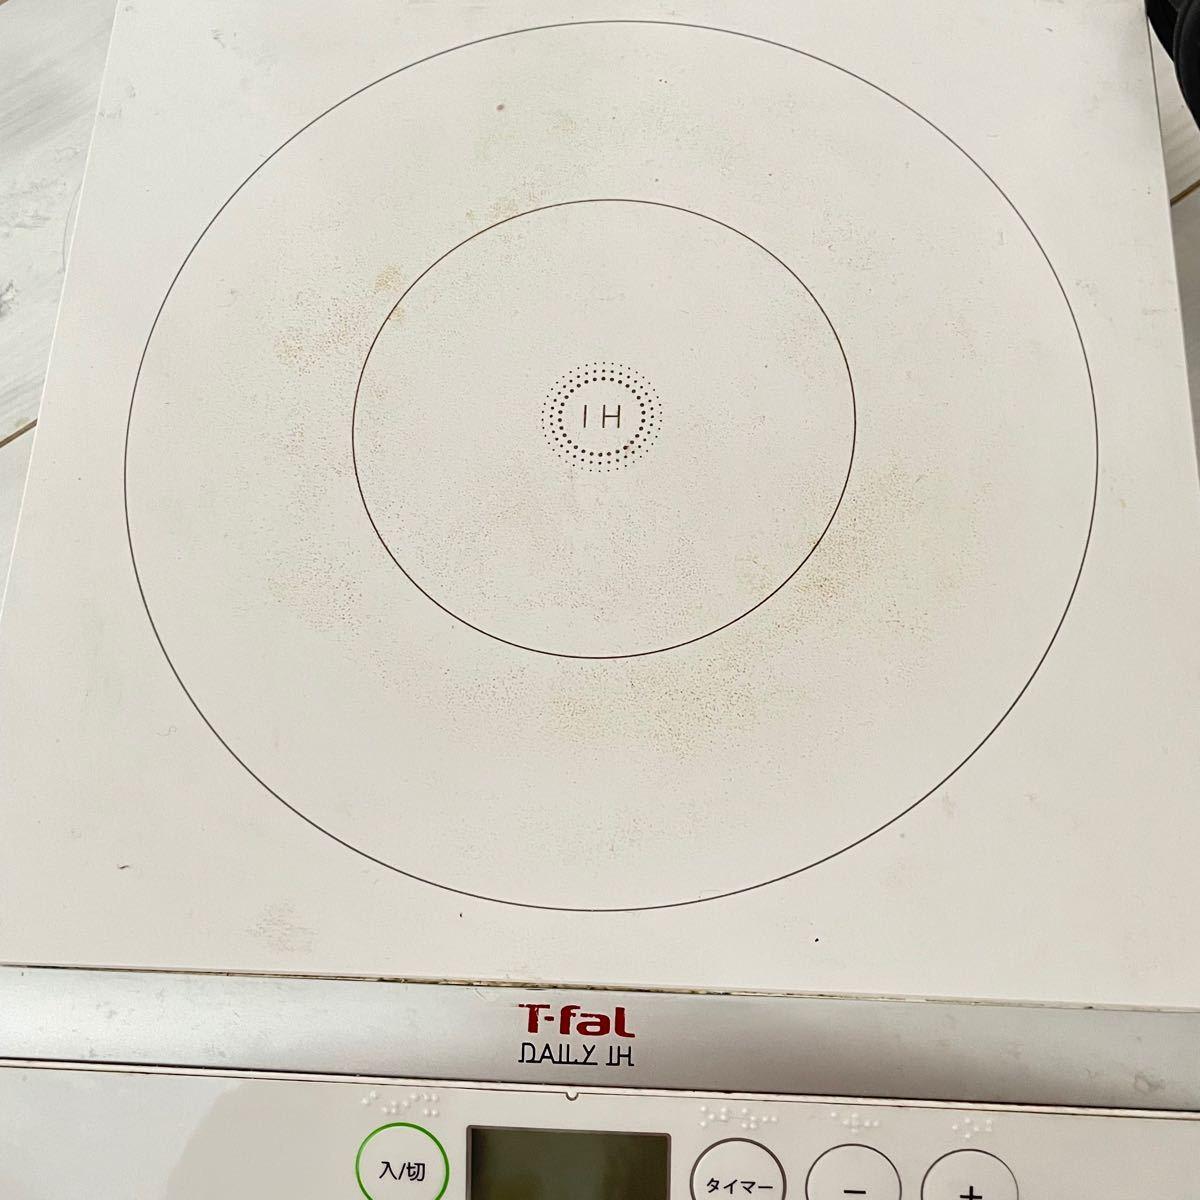 T-fal IH調理器 1400w デイリーIH IH2021JP 卓上調理器